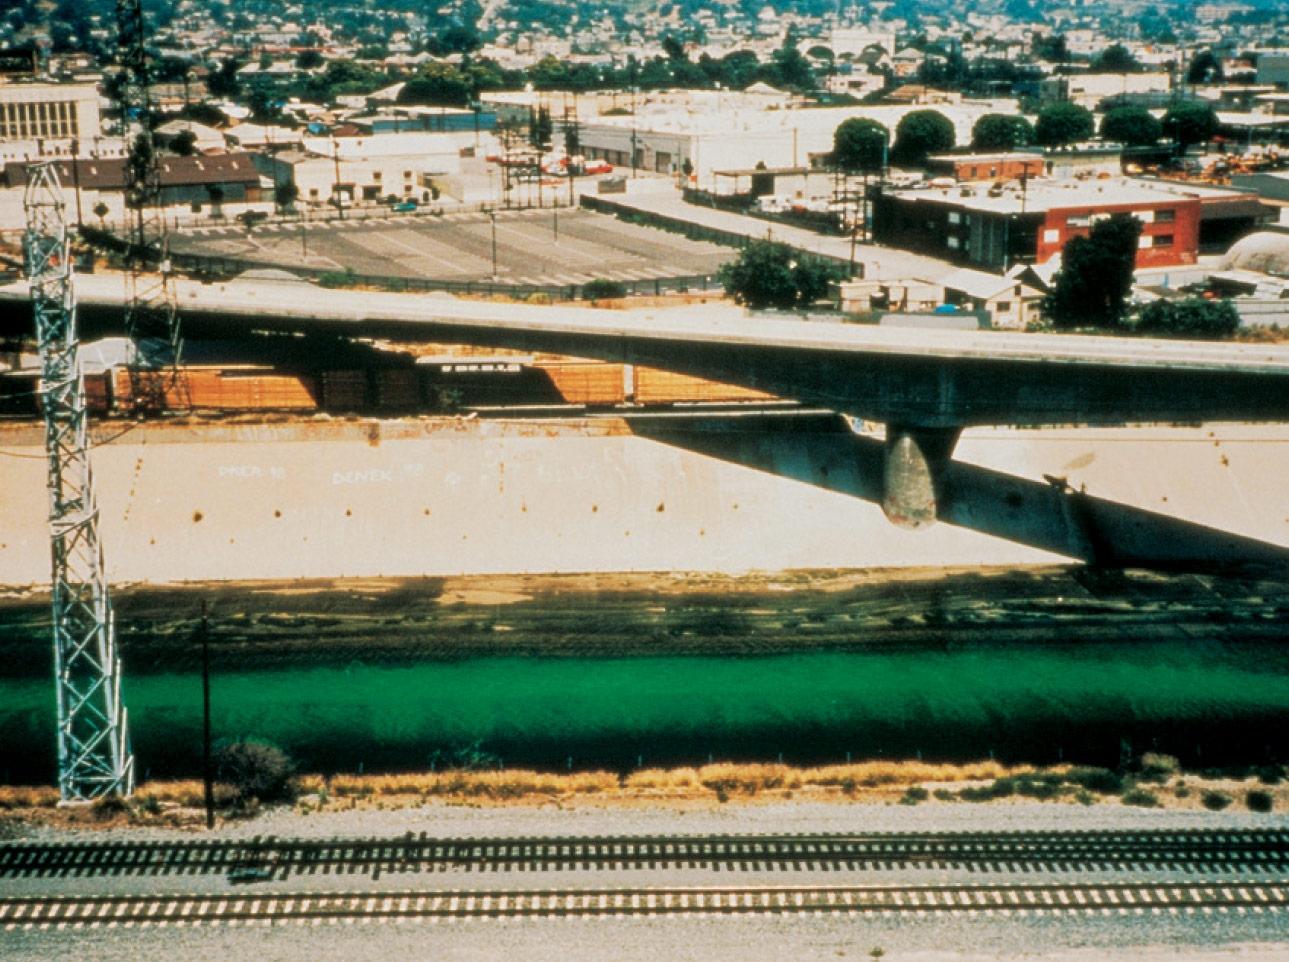 <strong>'Green river'</strong>, 1998, Uranine, water, Bremen, Germany, 1998 Photo: Helmut Wieben Courtesy of the artist; neugerriemschneider, Berlin; and Tanya Bonakdar Gallery, New York © Olafur Eliasson